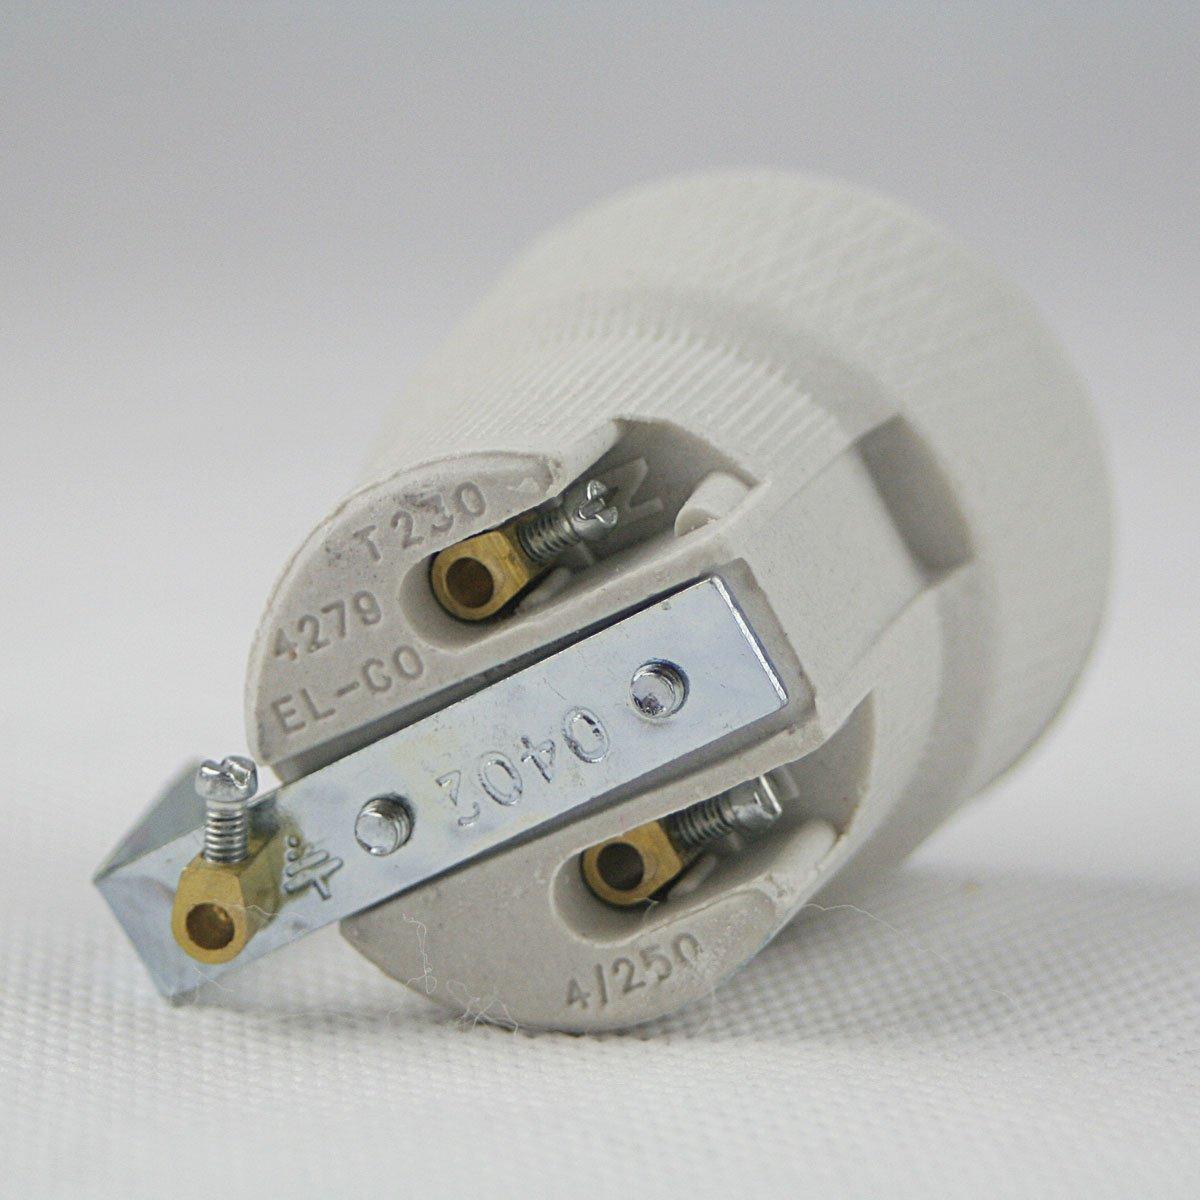 Porzellan-Fassung E27 250V/4A, Befestigungsbügel: Amazon.de: Elektronik